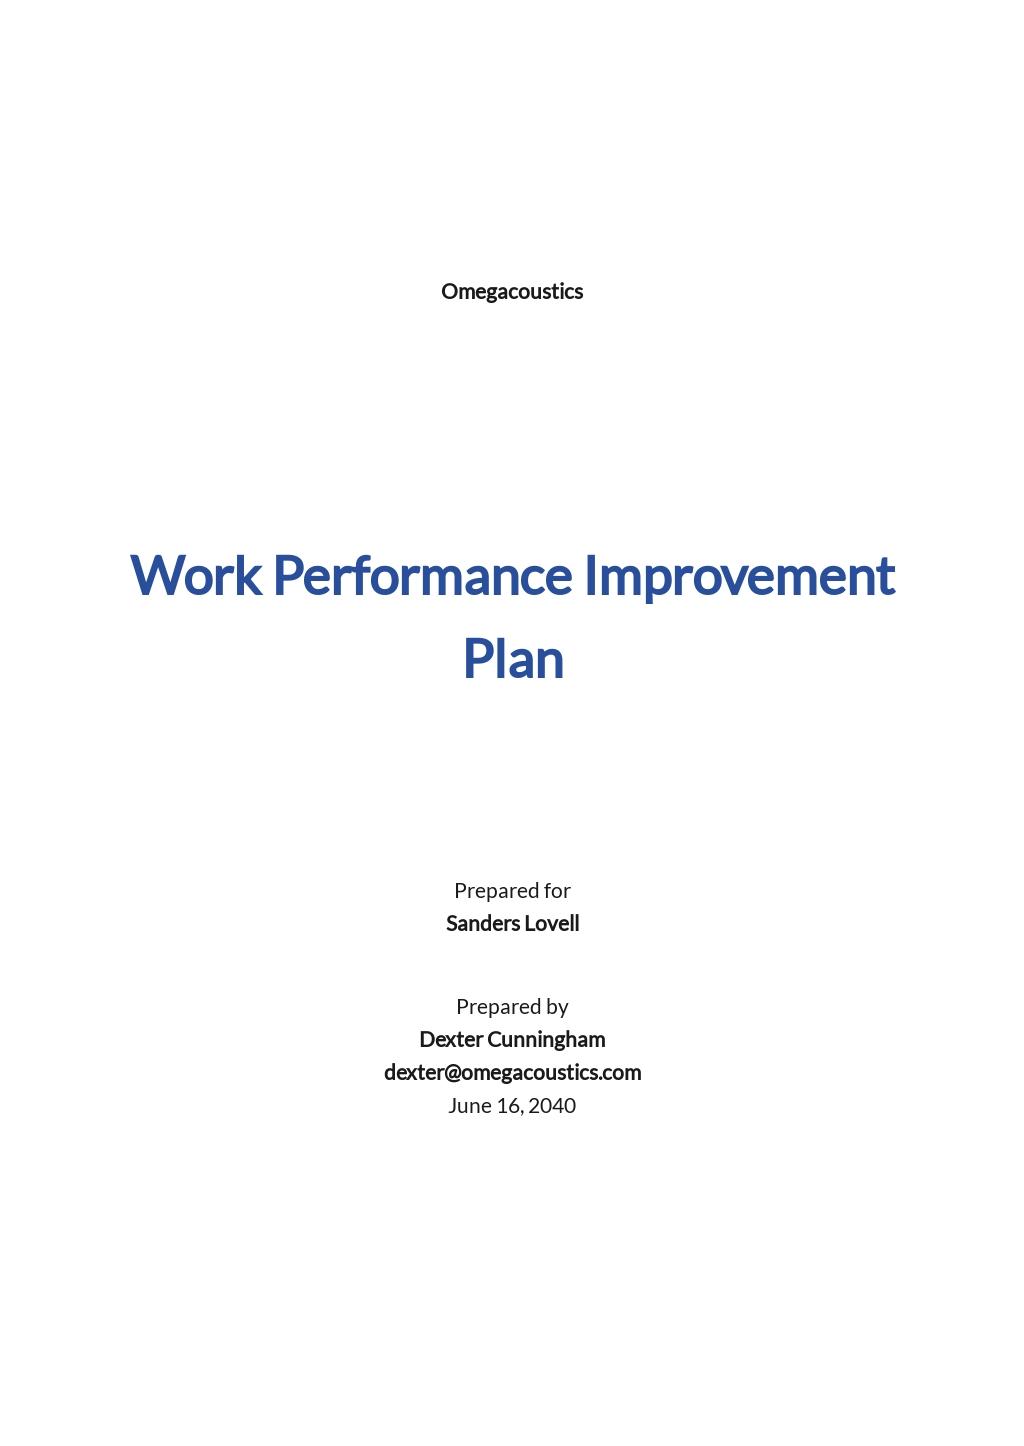 Work Performance Improvement Plan Template.jpe